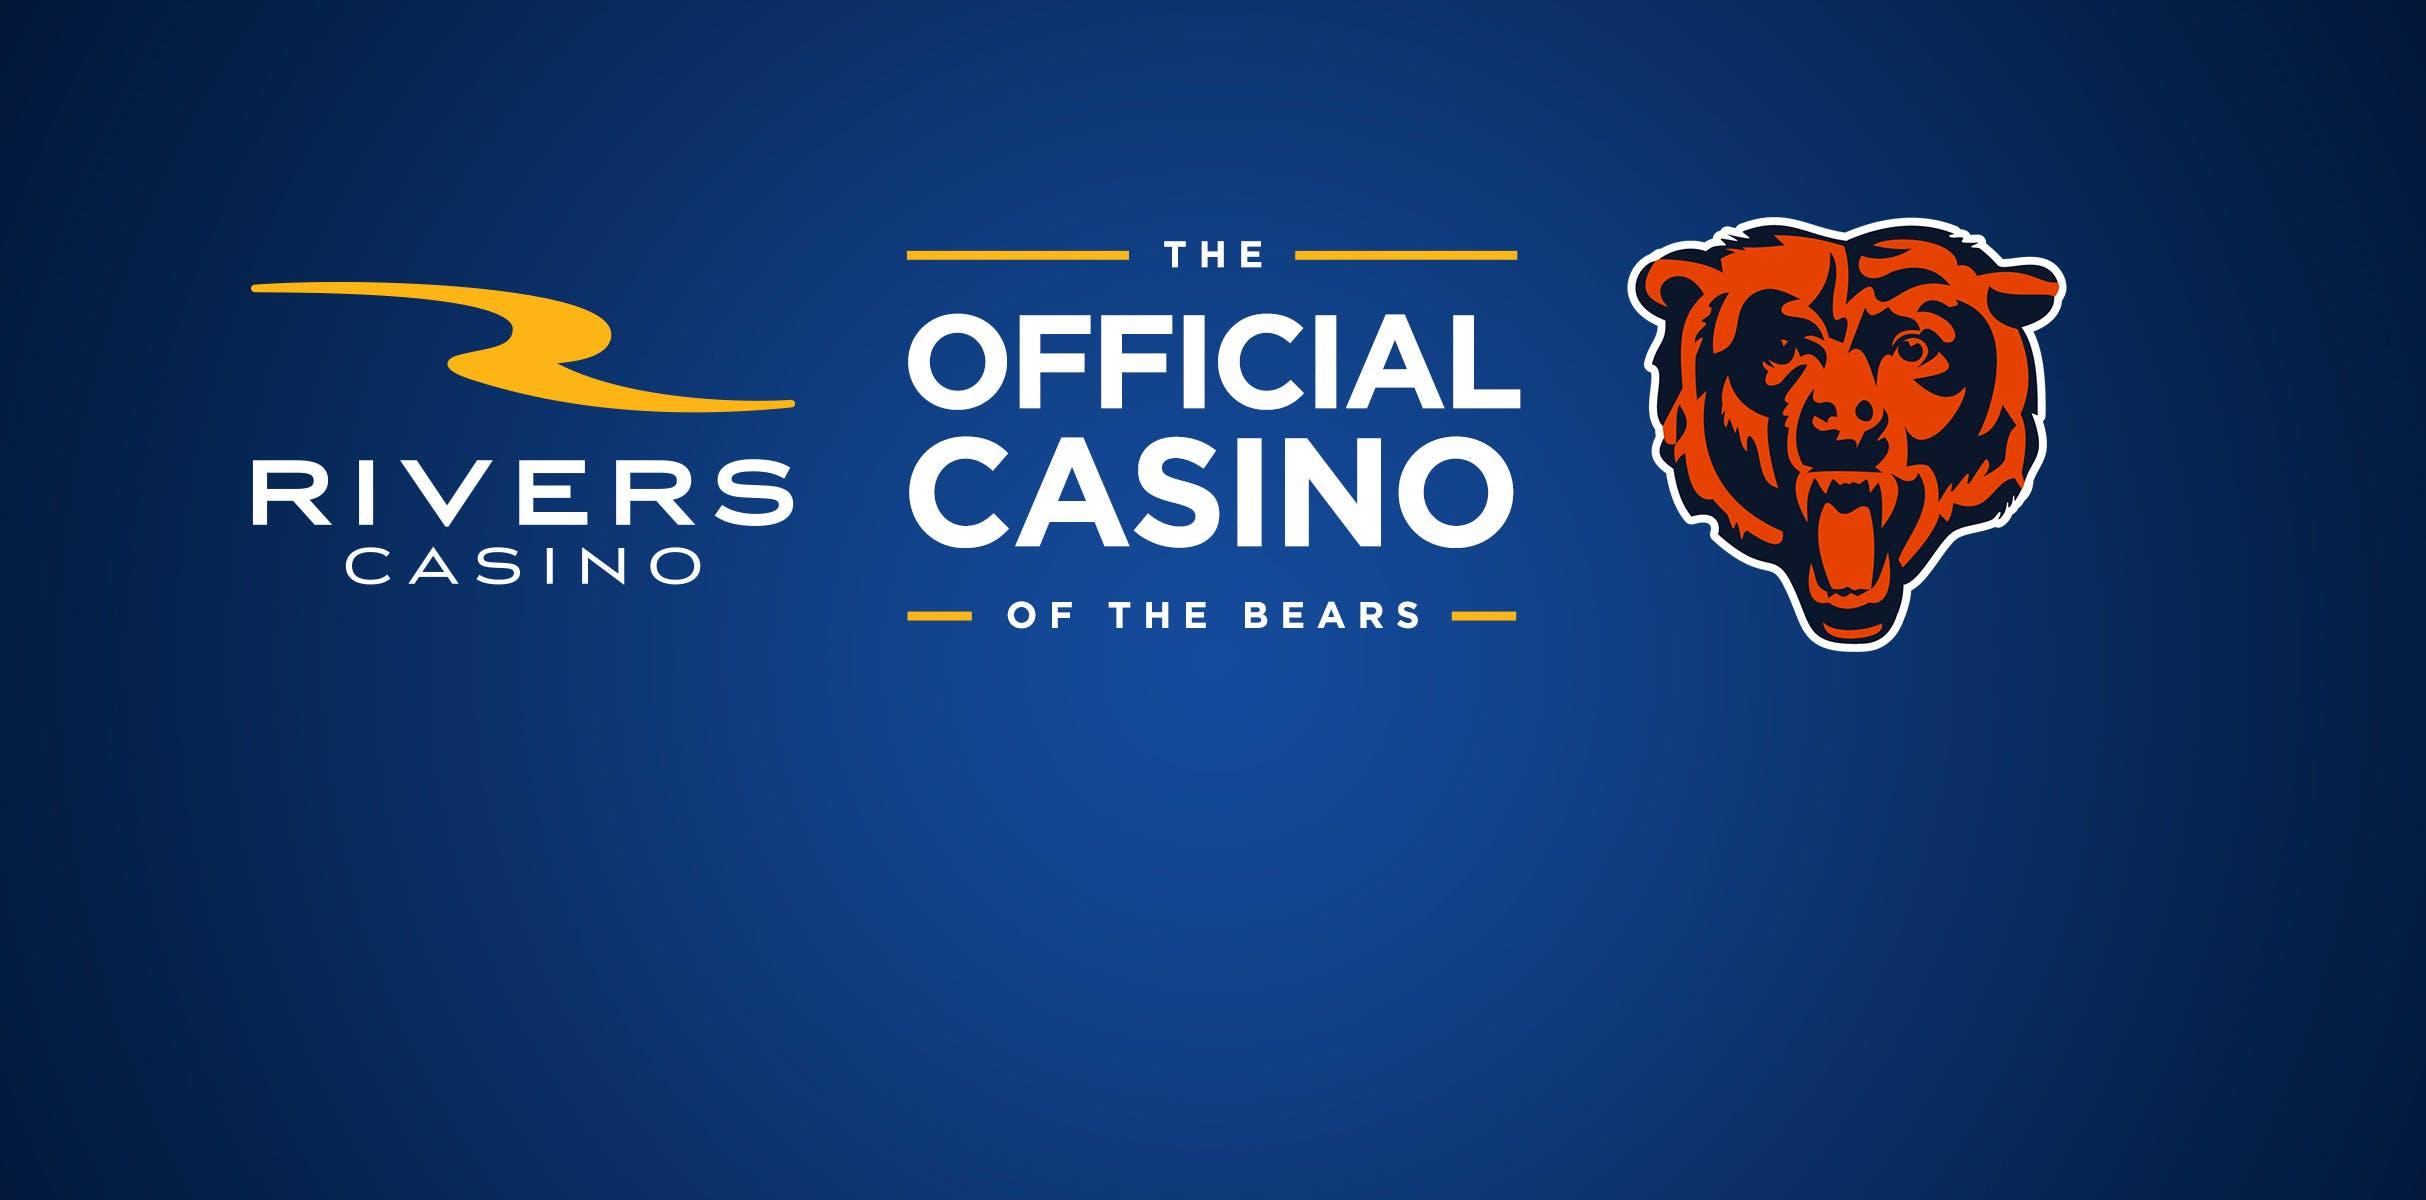 Press Release: Chicago Bears Partnership